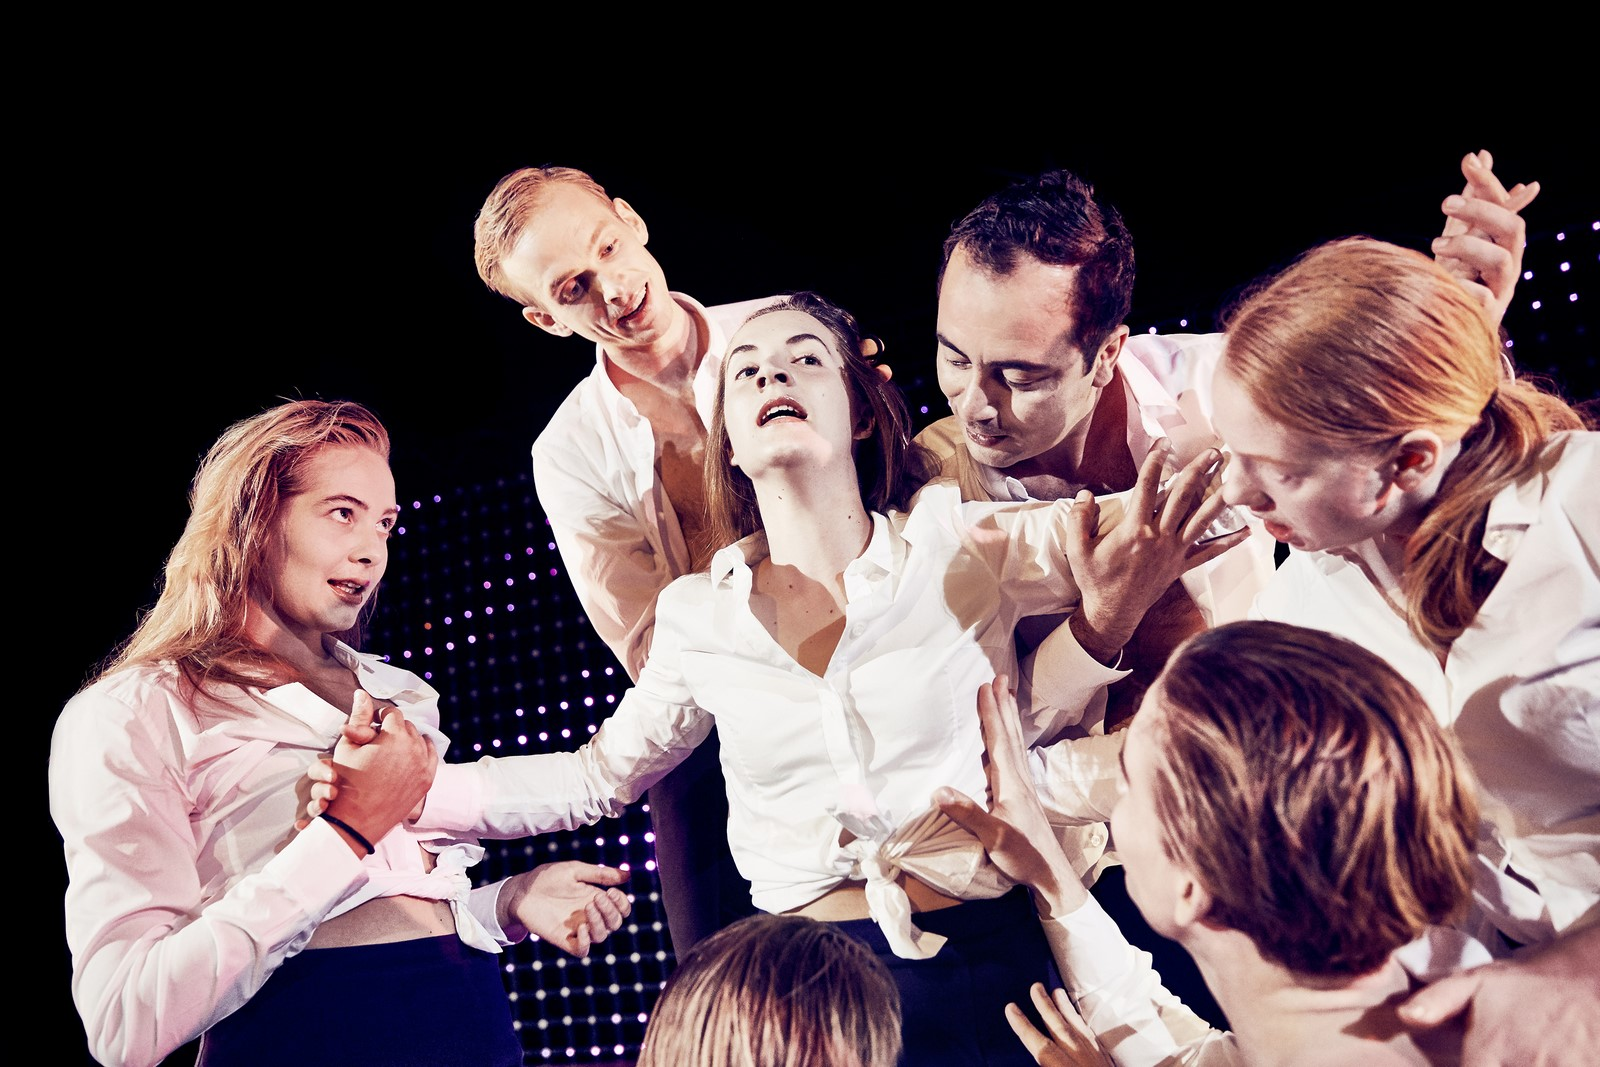 Anmeldelse: Anslag mod hendes liv, Odense Teater (Den Danske Scenekunstskole – Skuespiluddannelsen Odense)